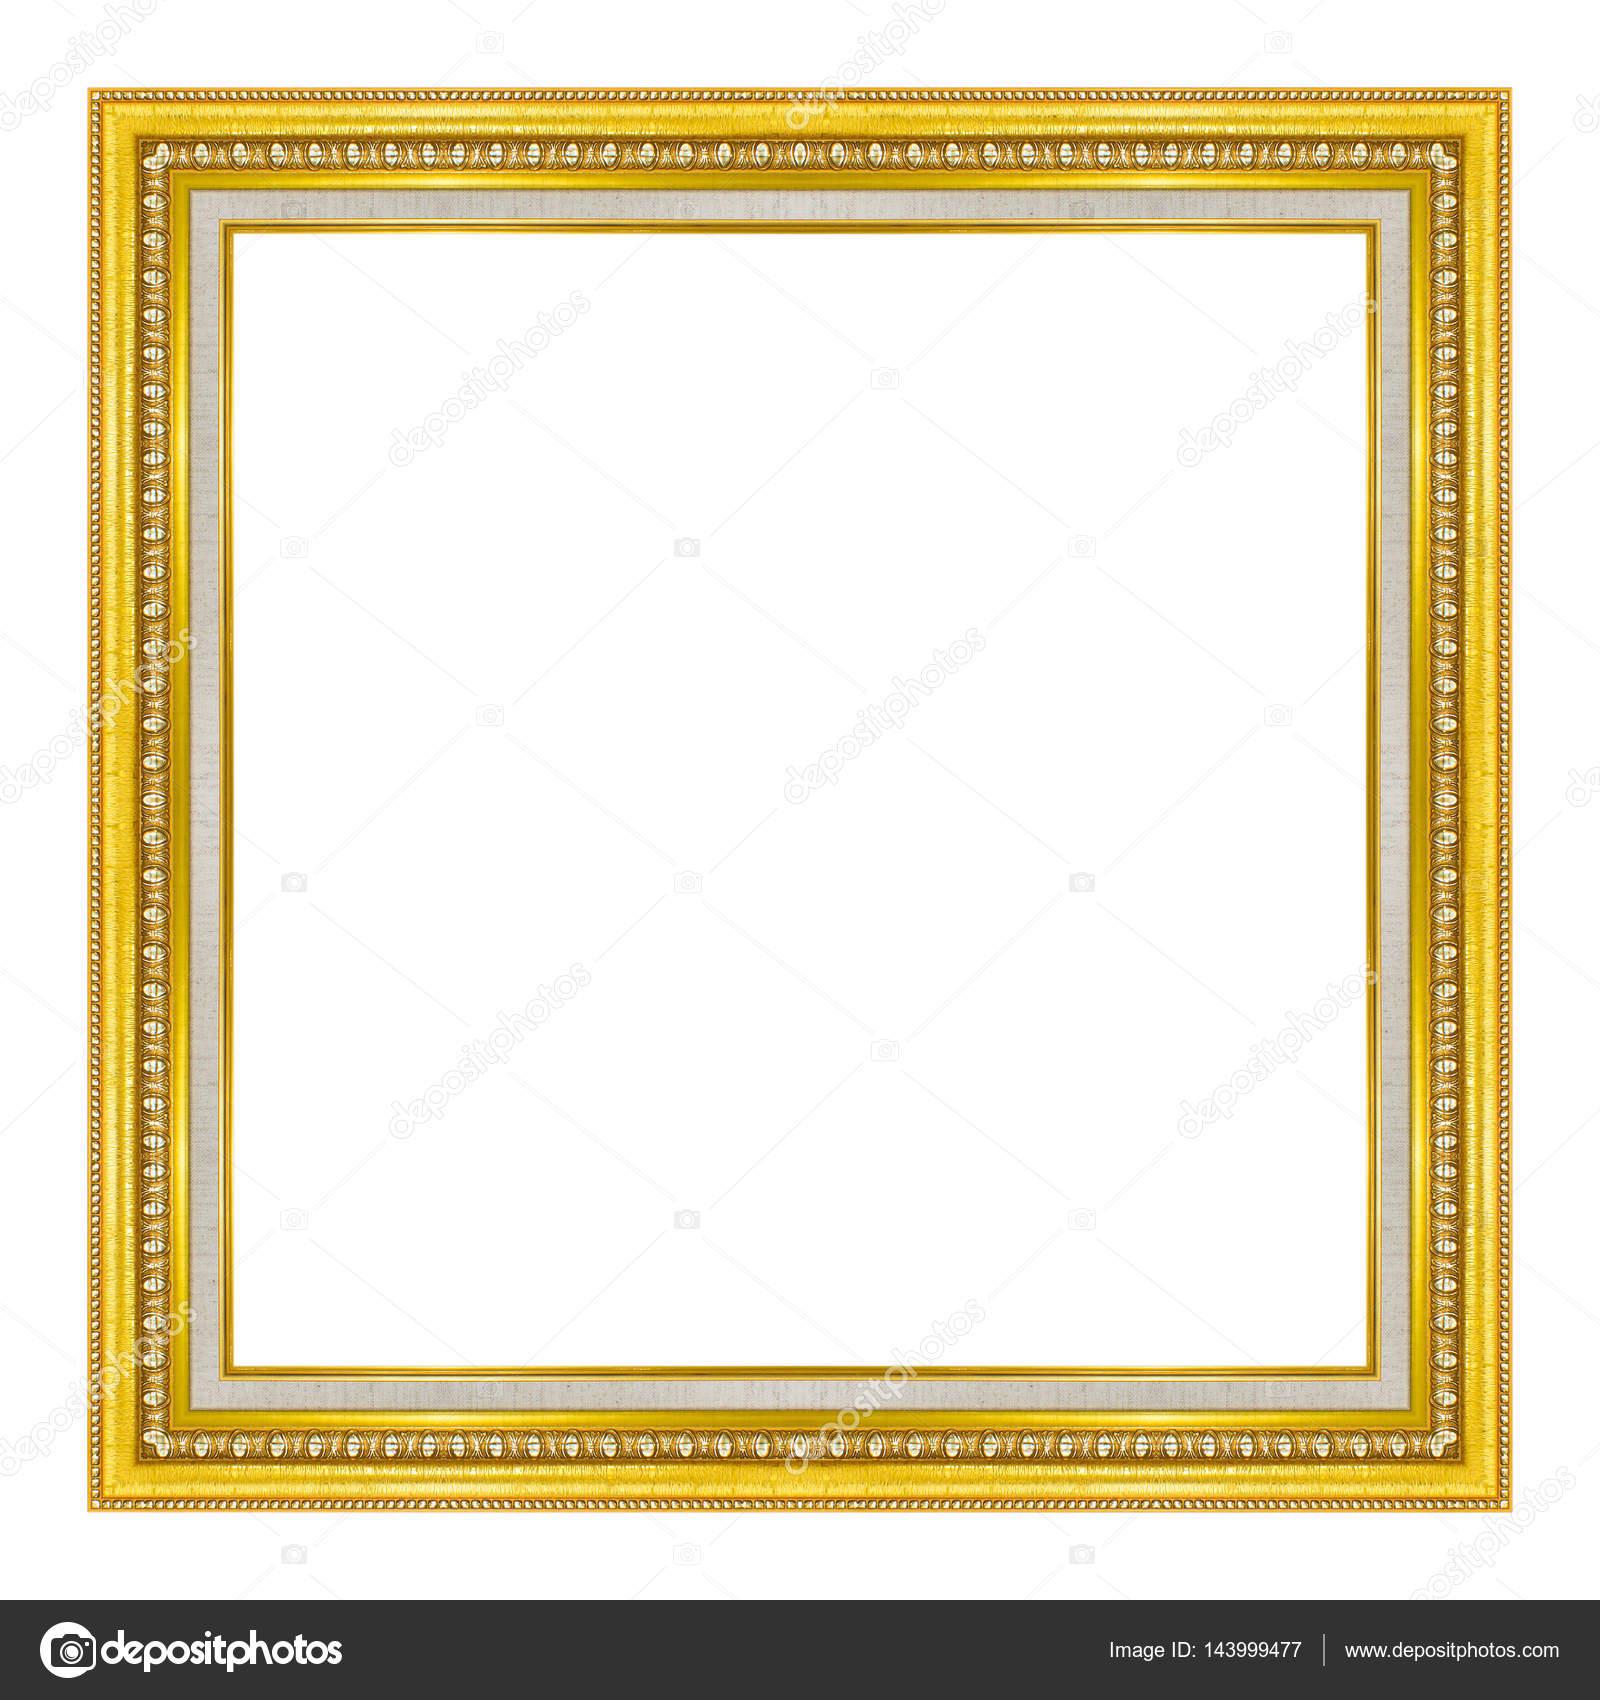 cuadro marco madera oro tallado patrón aislada sobre fondo blanco ...